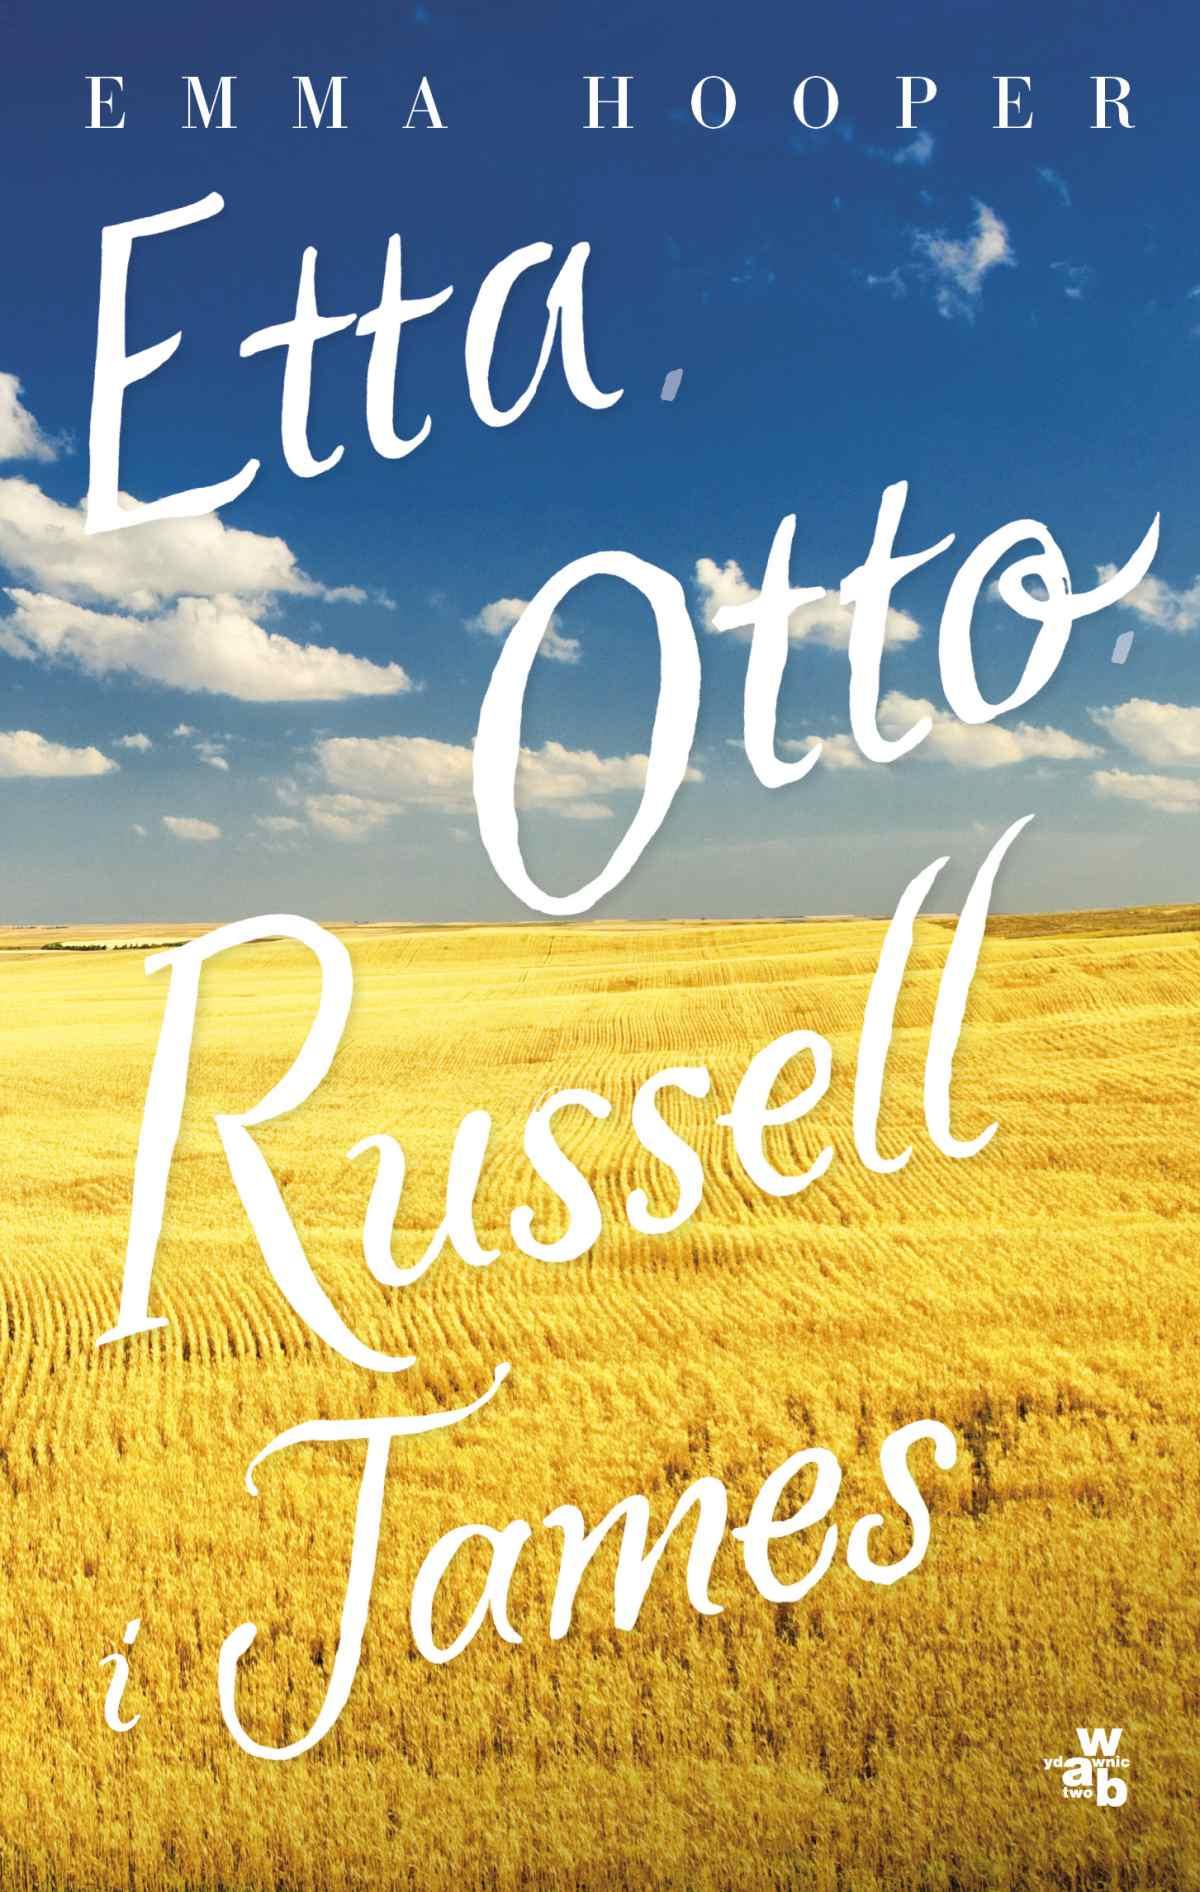 Etta, Otto, Russell i James - Ebook (Książka na Kindle) do pobrania w formacie MOBI